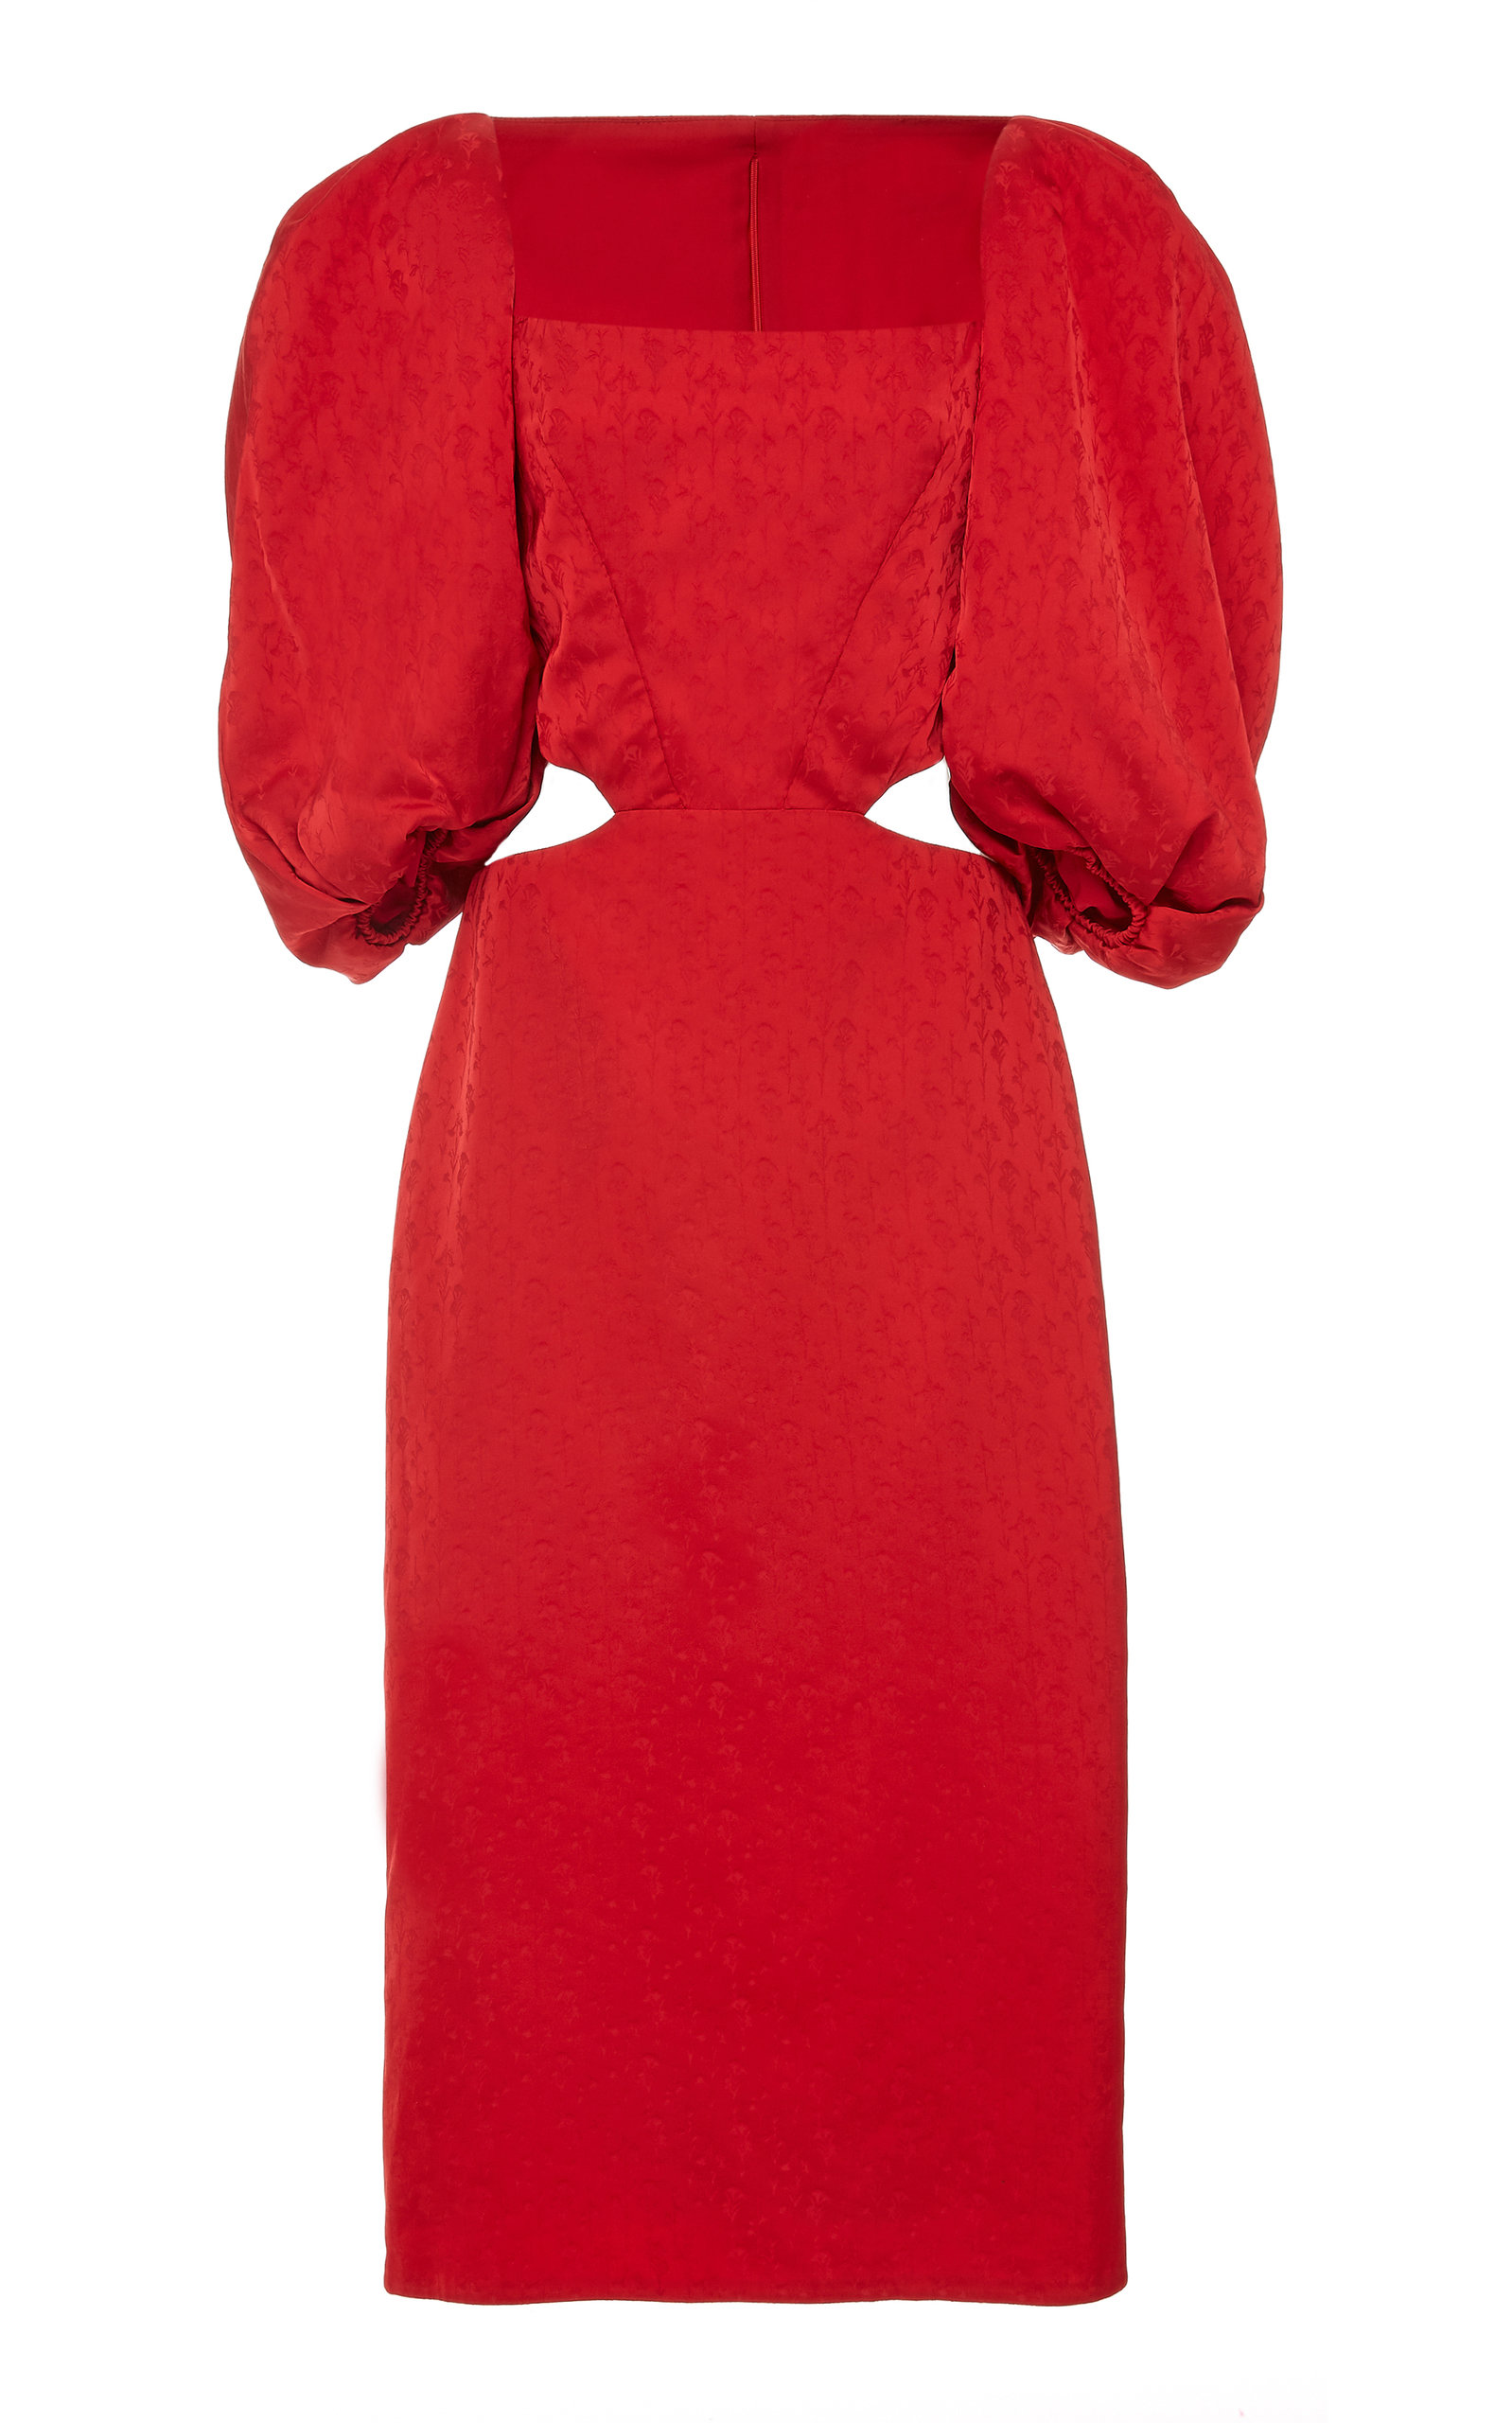 Buy Johanna Ortiz Exclusive Forgotten Virtues Dress online, shop Johanna Ortiz at the best price